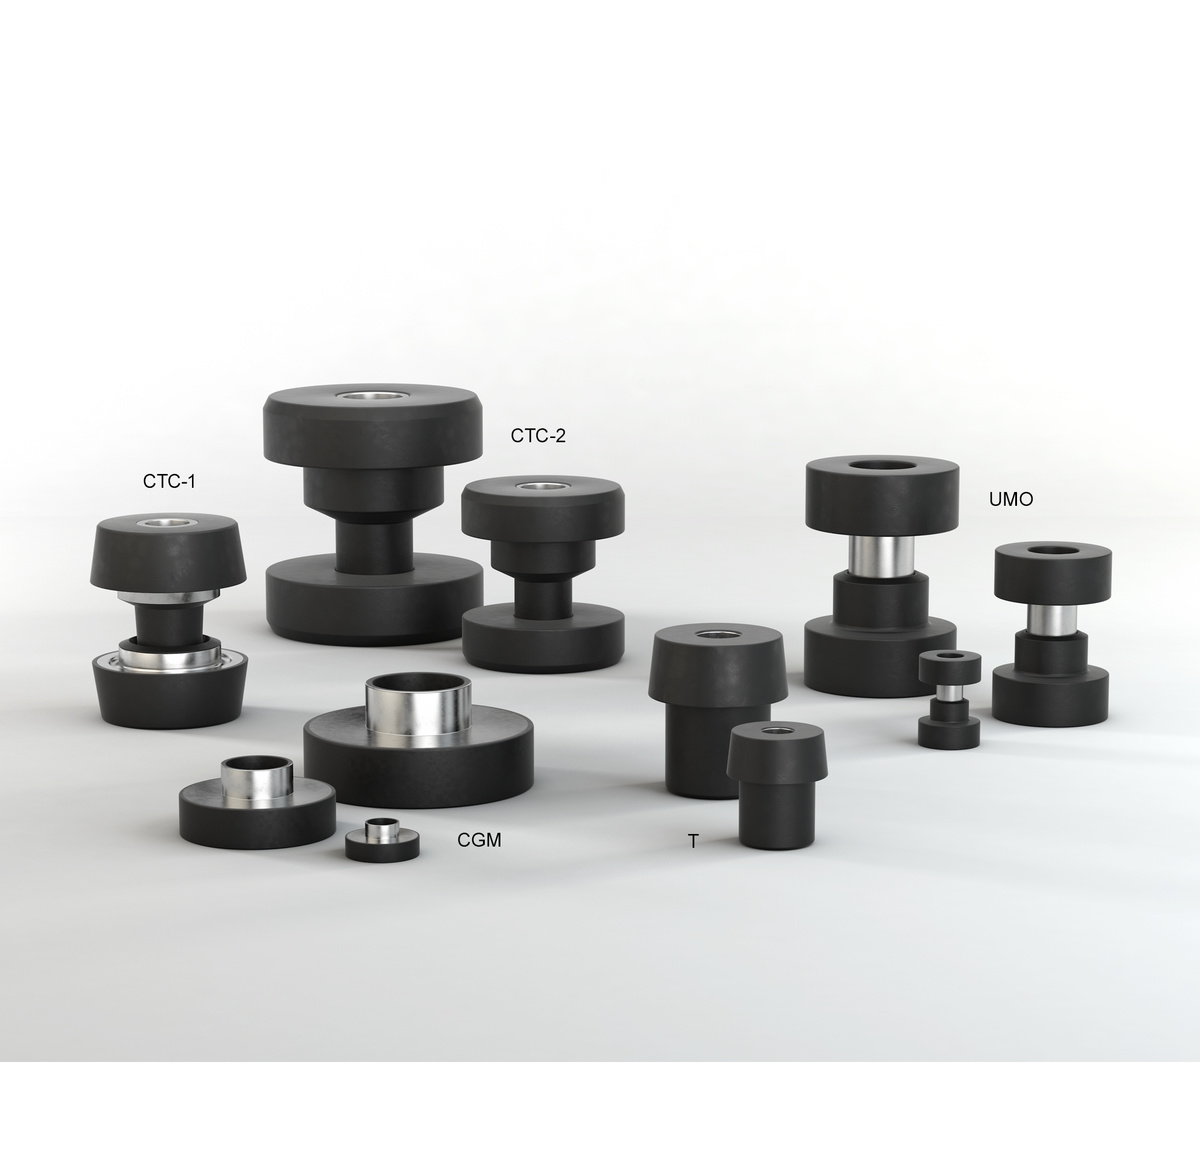 ACE Stoßdämpfer GmbH - Bild - Universal Mounts